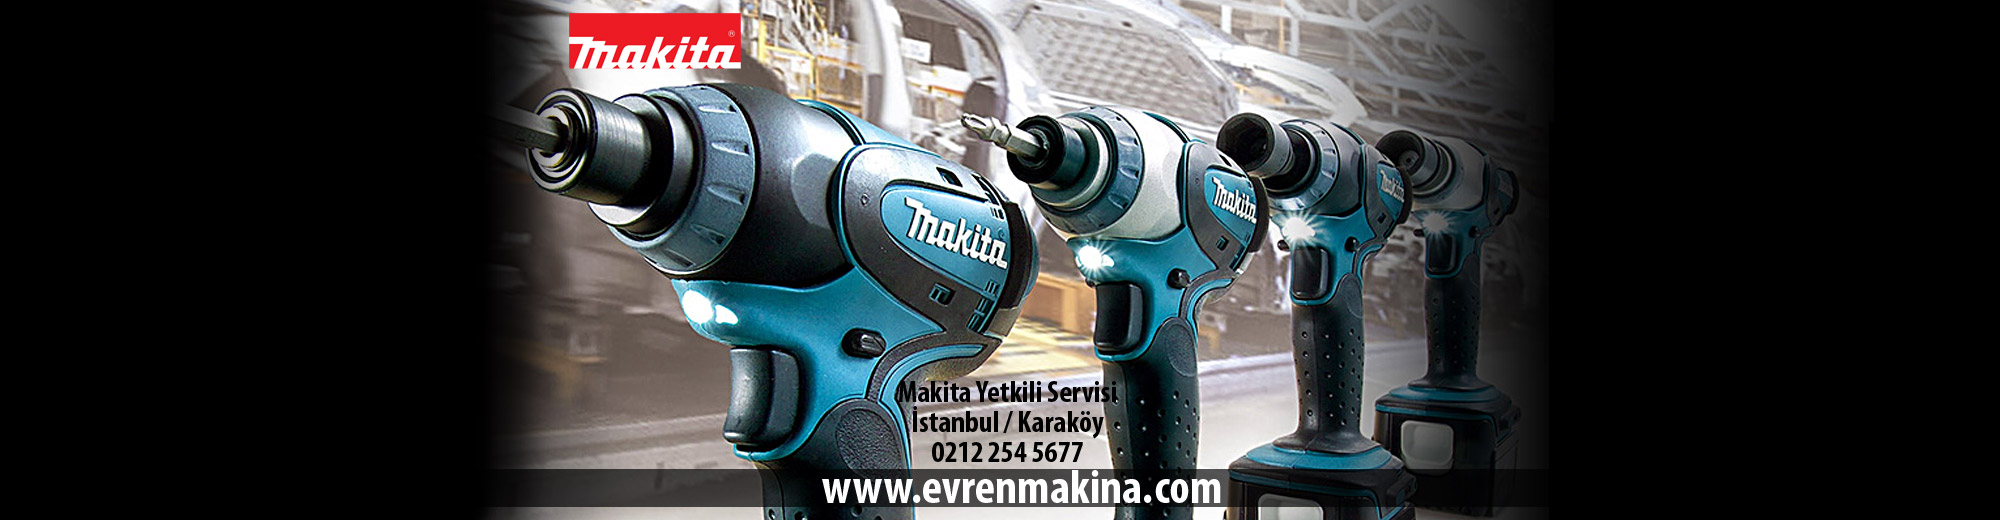 Makita Yetkili Servisi İstanbul